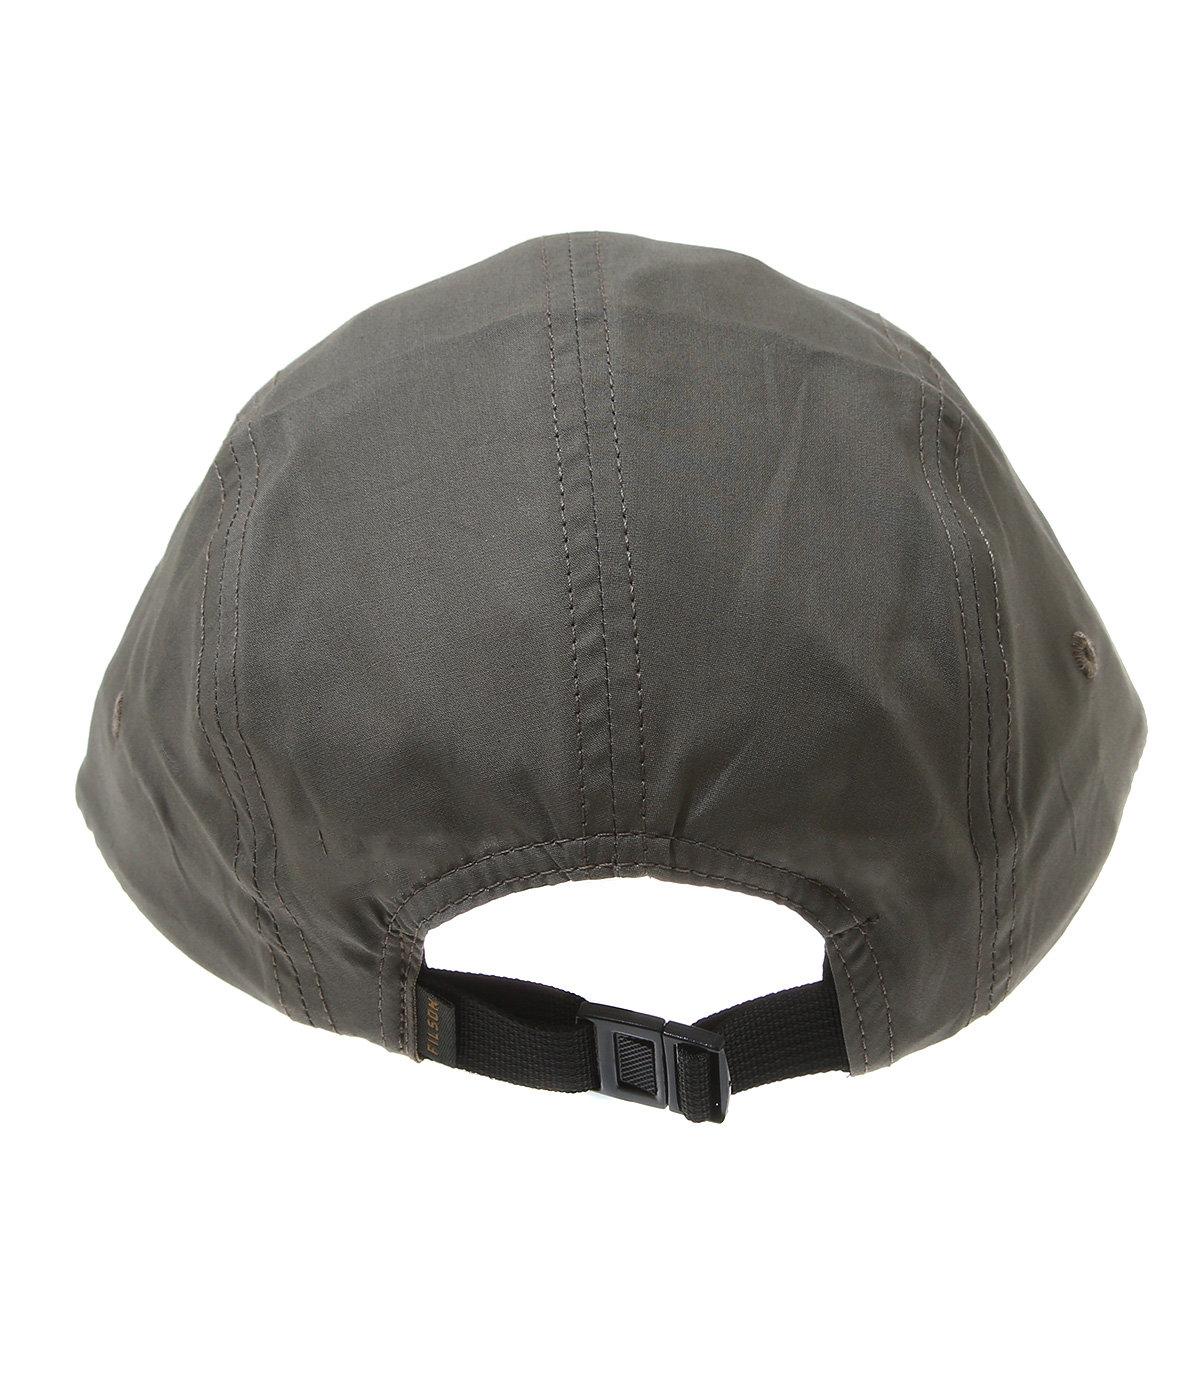 DUCKBILL CAP